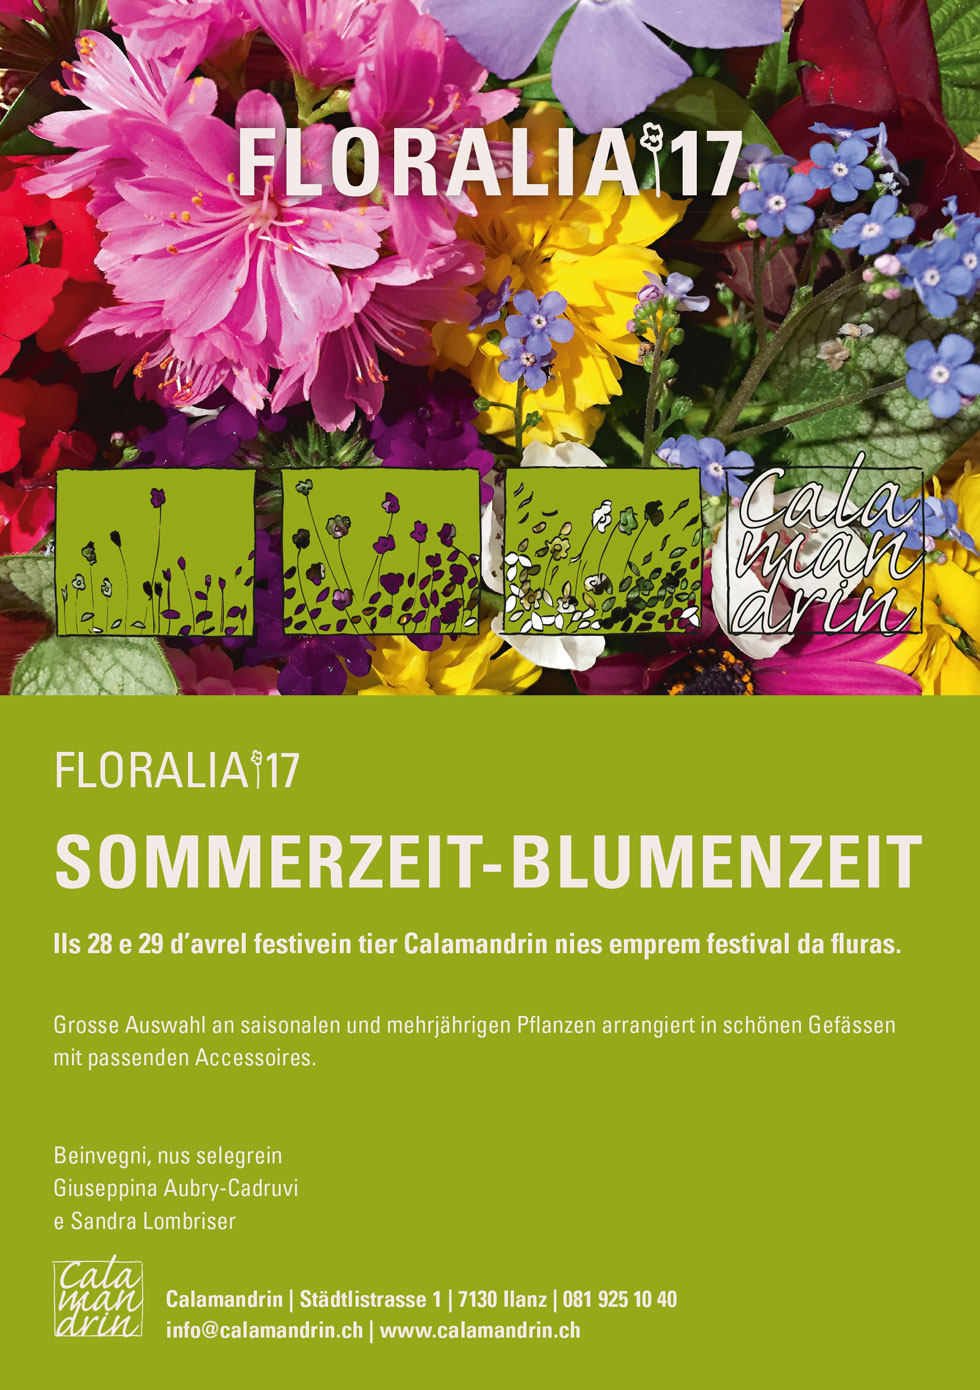 A6_floralia_karte-1